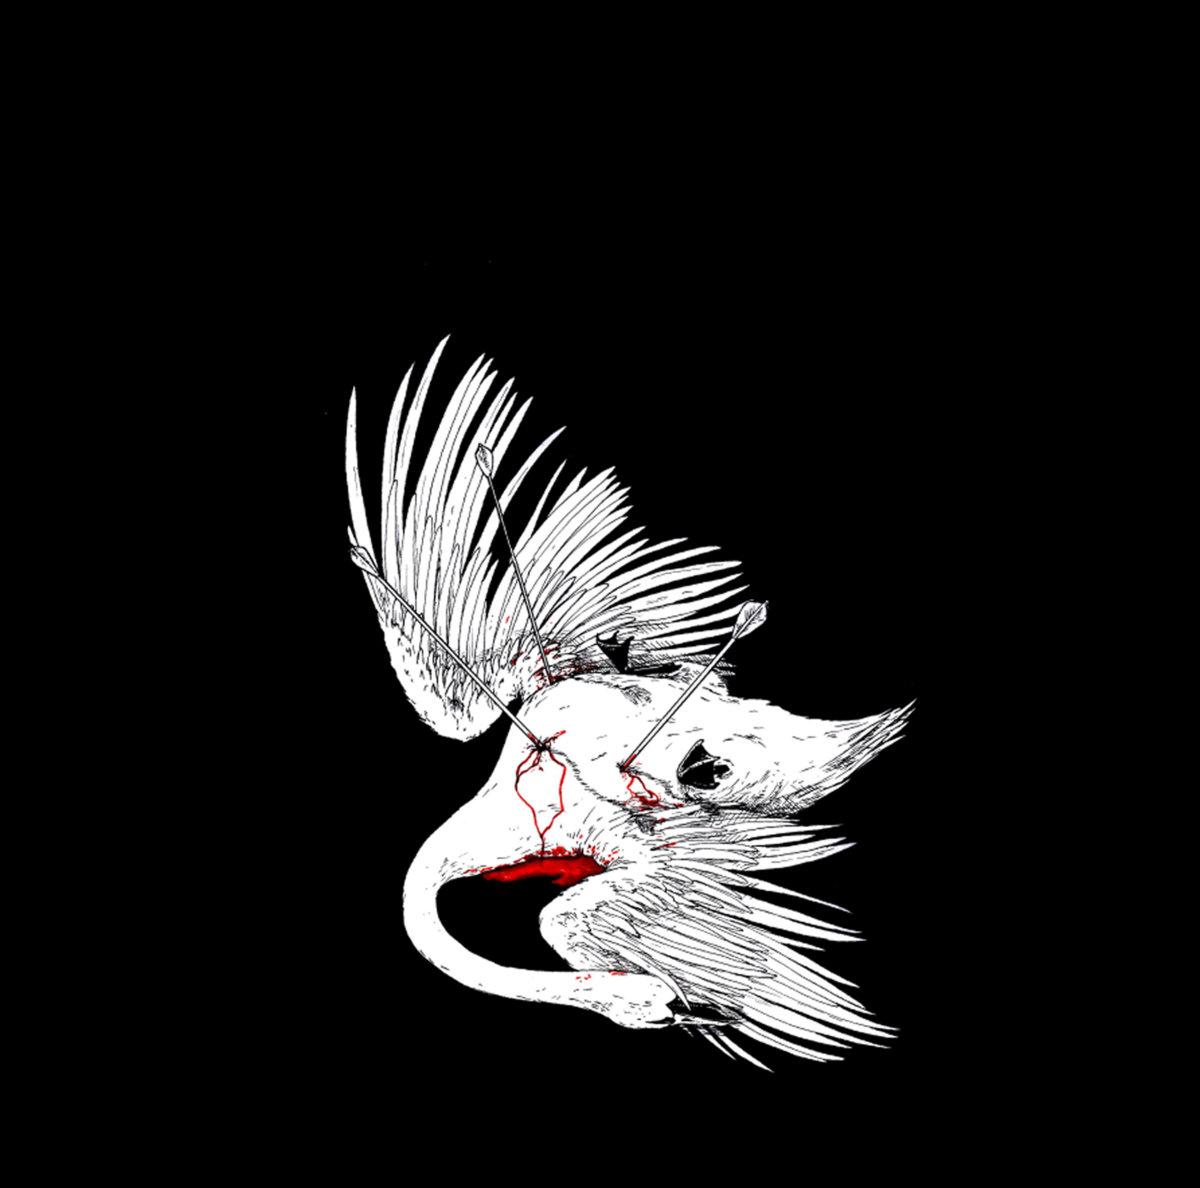 Invoker - Cursed to Feel [EP] (2018)